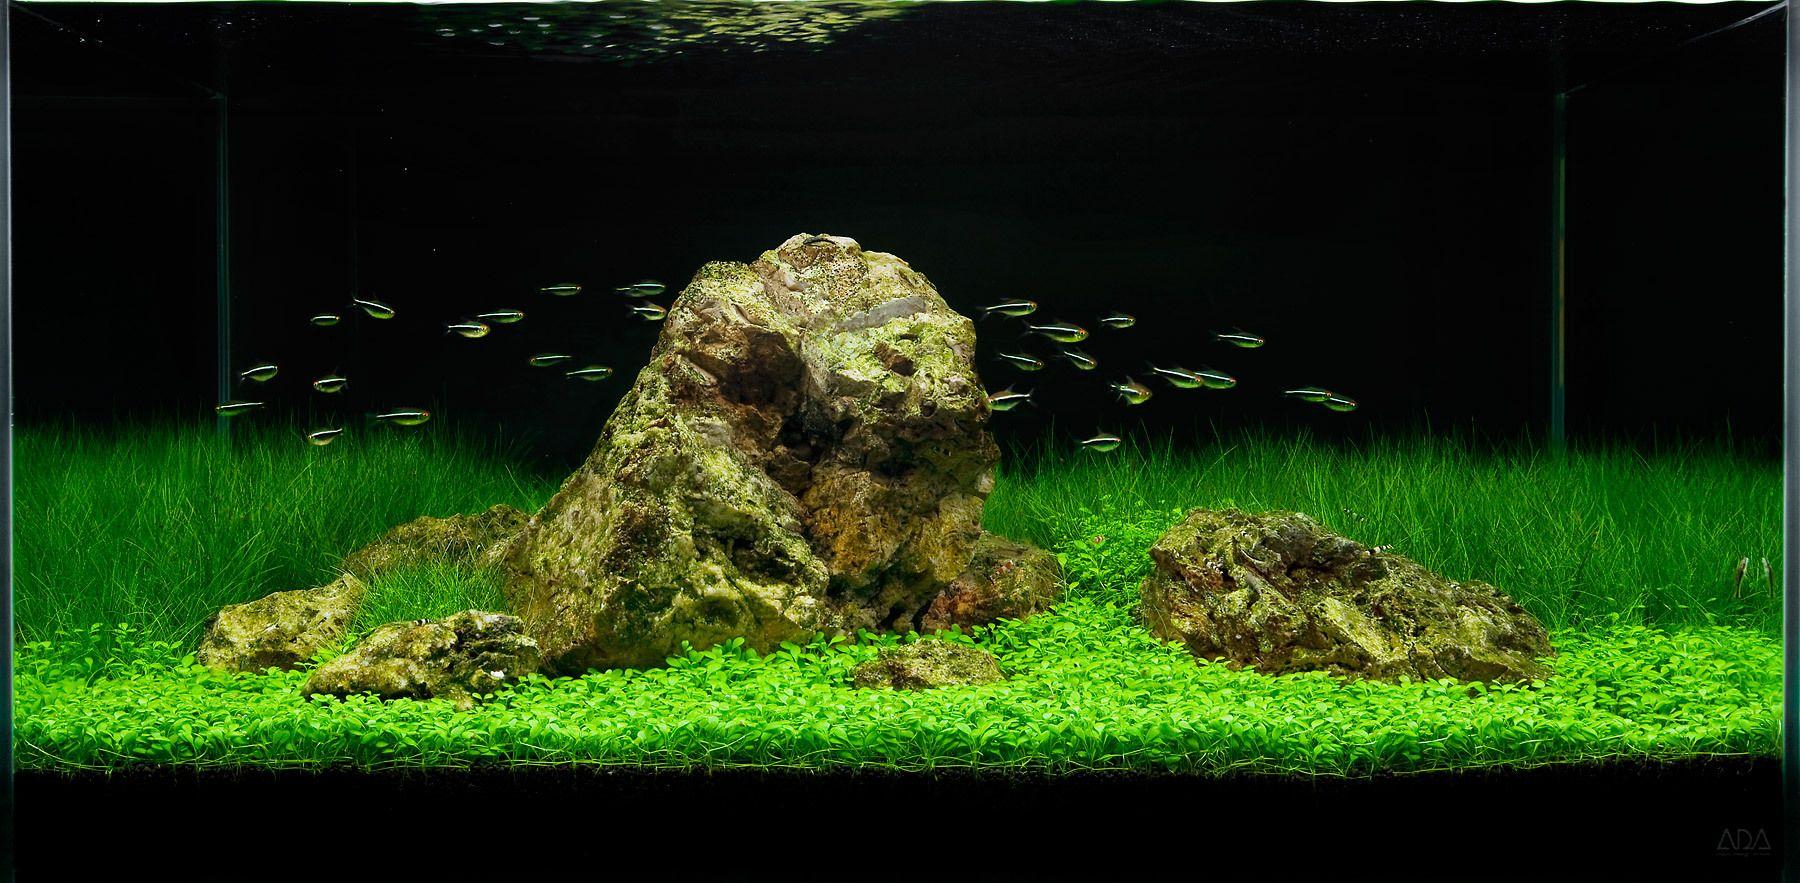 Aquascape Design aquarium design group - a tranquil aquascape in the ada 90-p